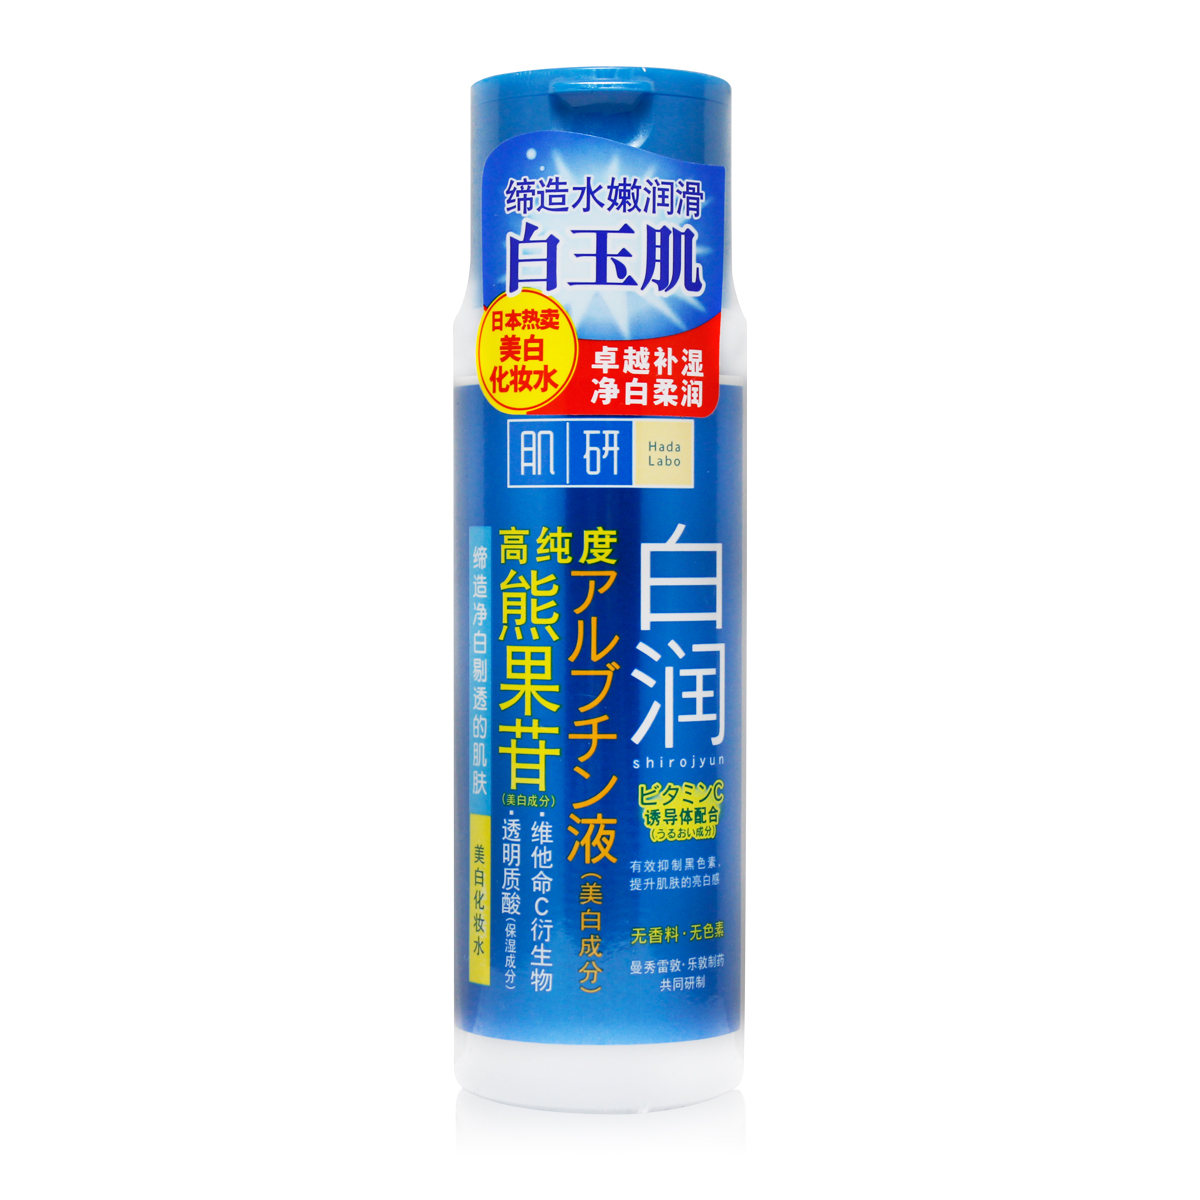 Mentholatum 曼秀雷敦 肌研白潤美白化妝水